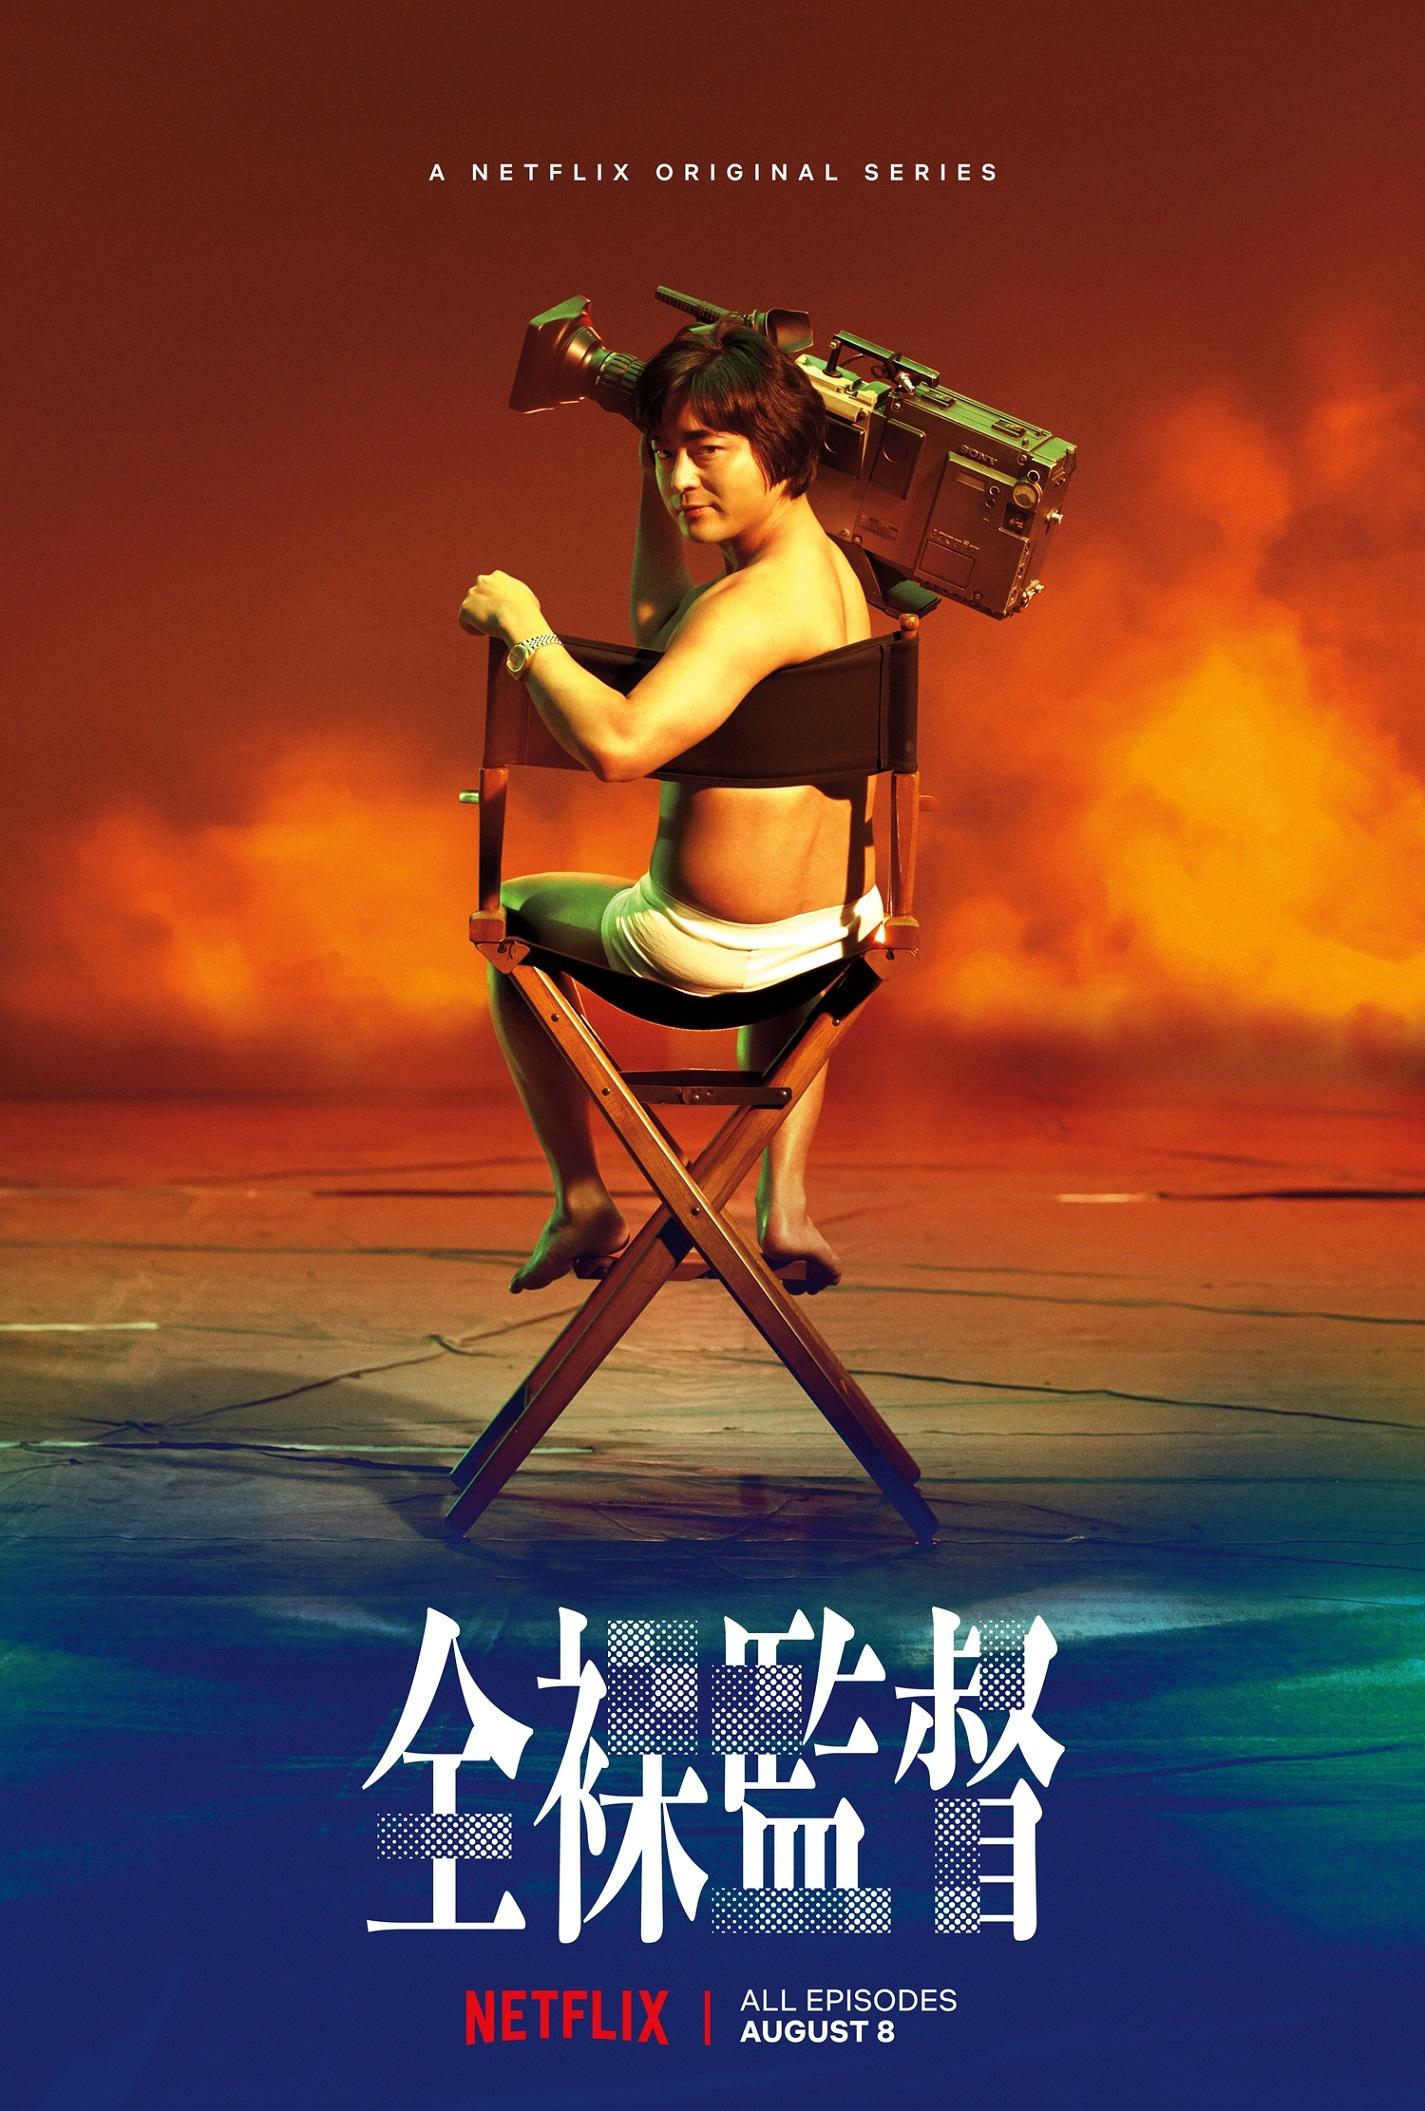 Netflixオリジナルシリーズ『全裸監督』 『全裸監督』は2019年8月8日(木)、Netflixにて全世界独占配信。